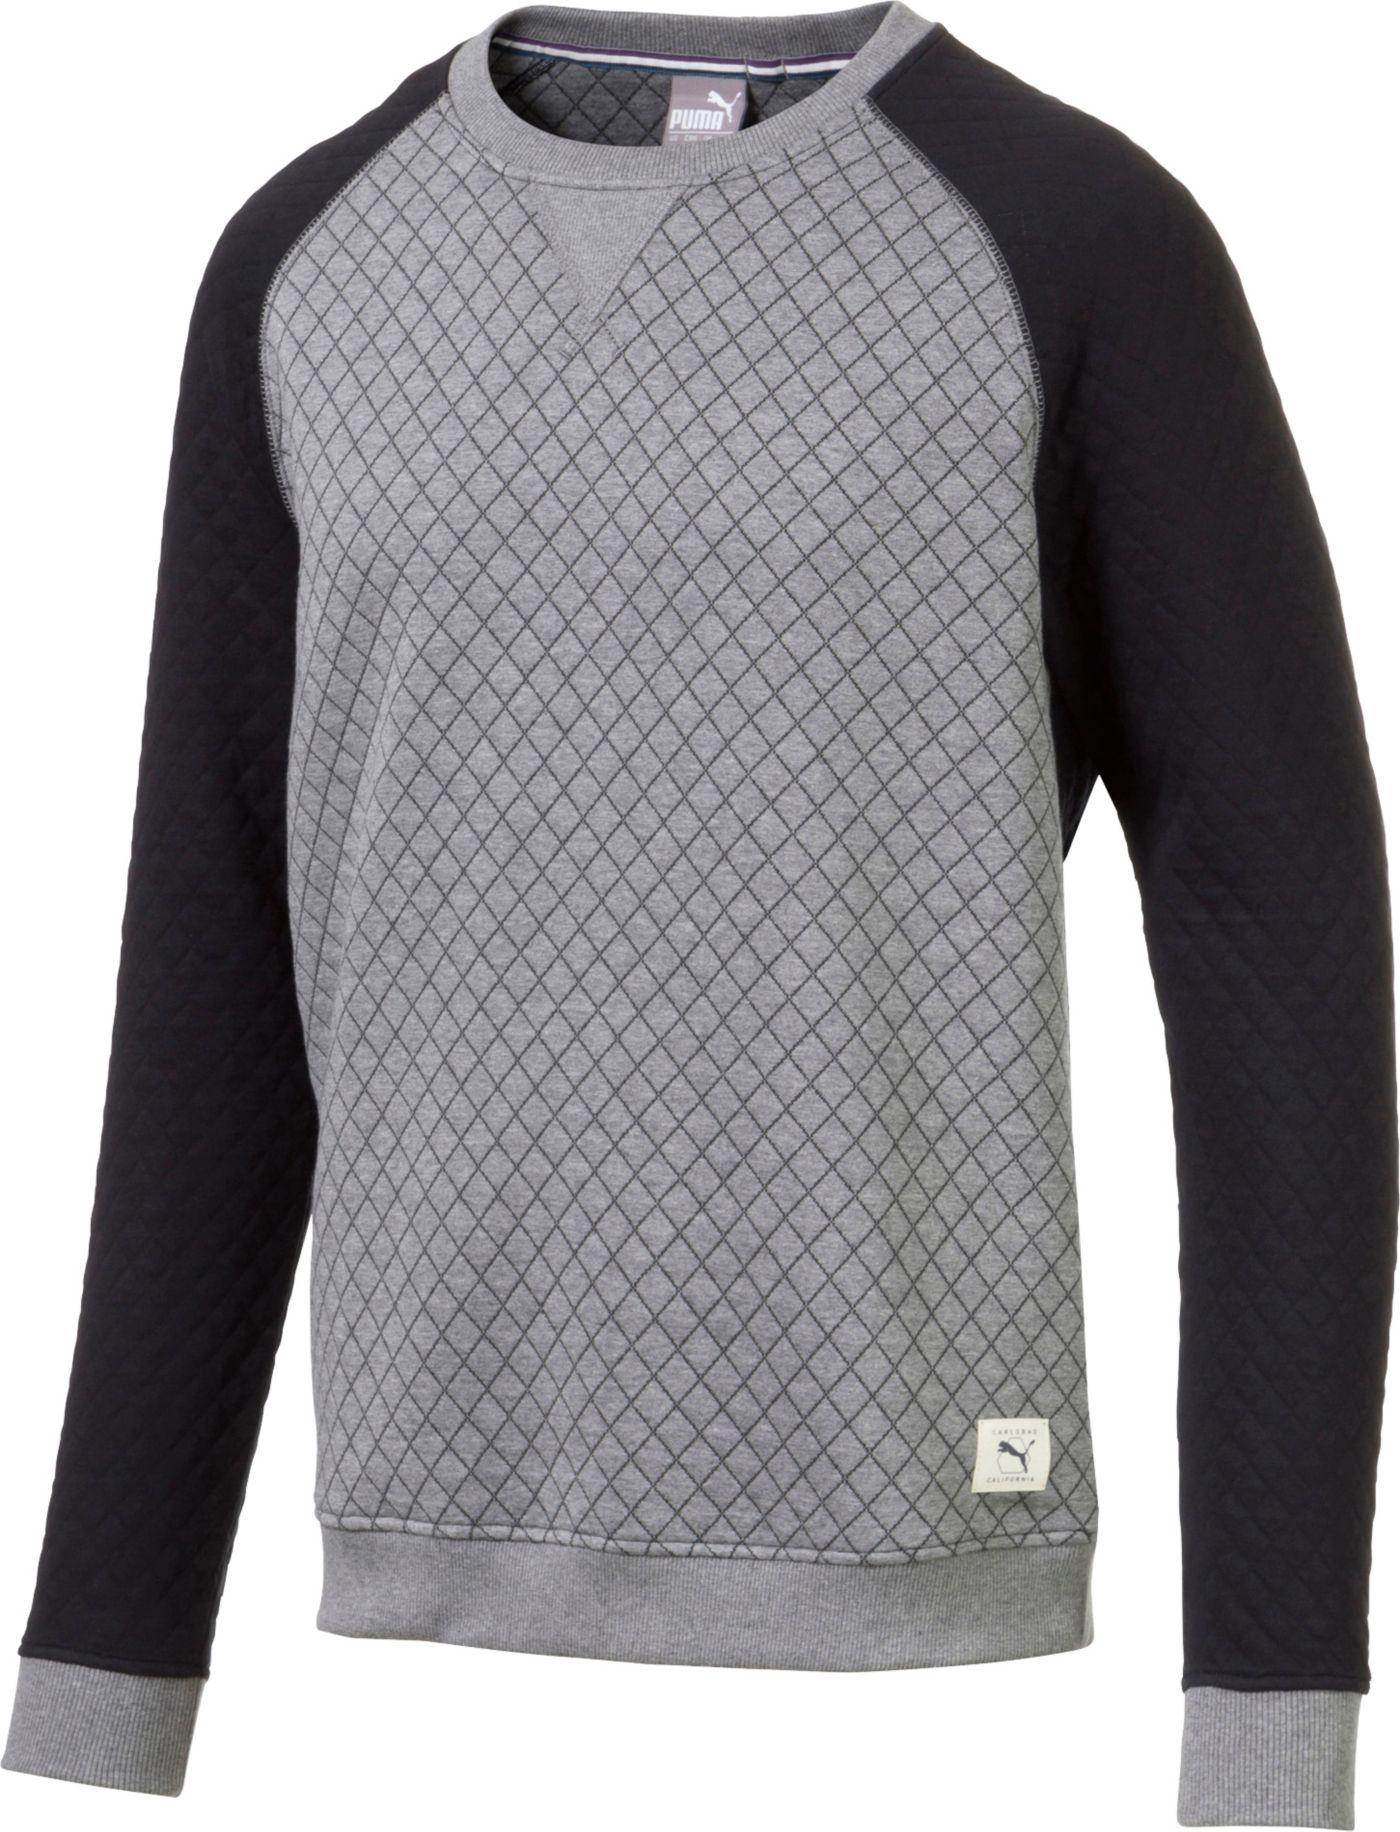 PUMA Men's Quilted Crew Neck Golf Sweater